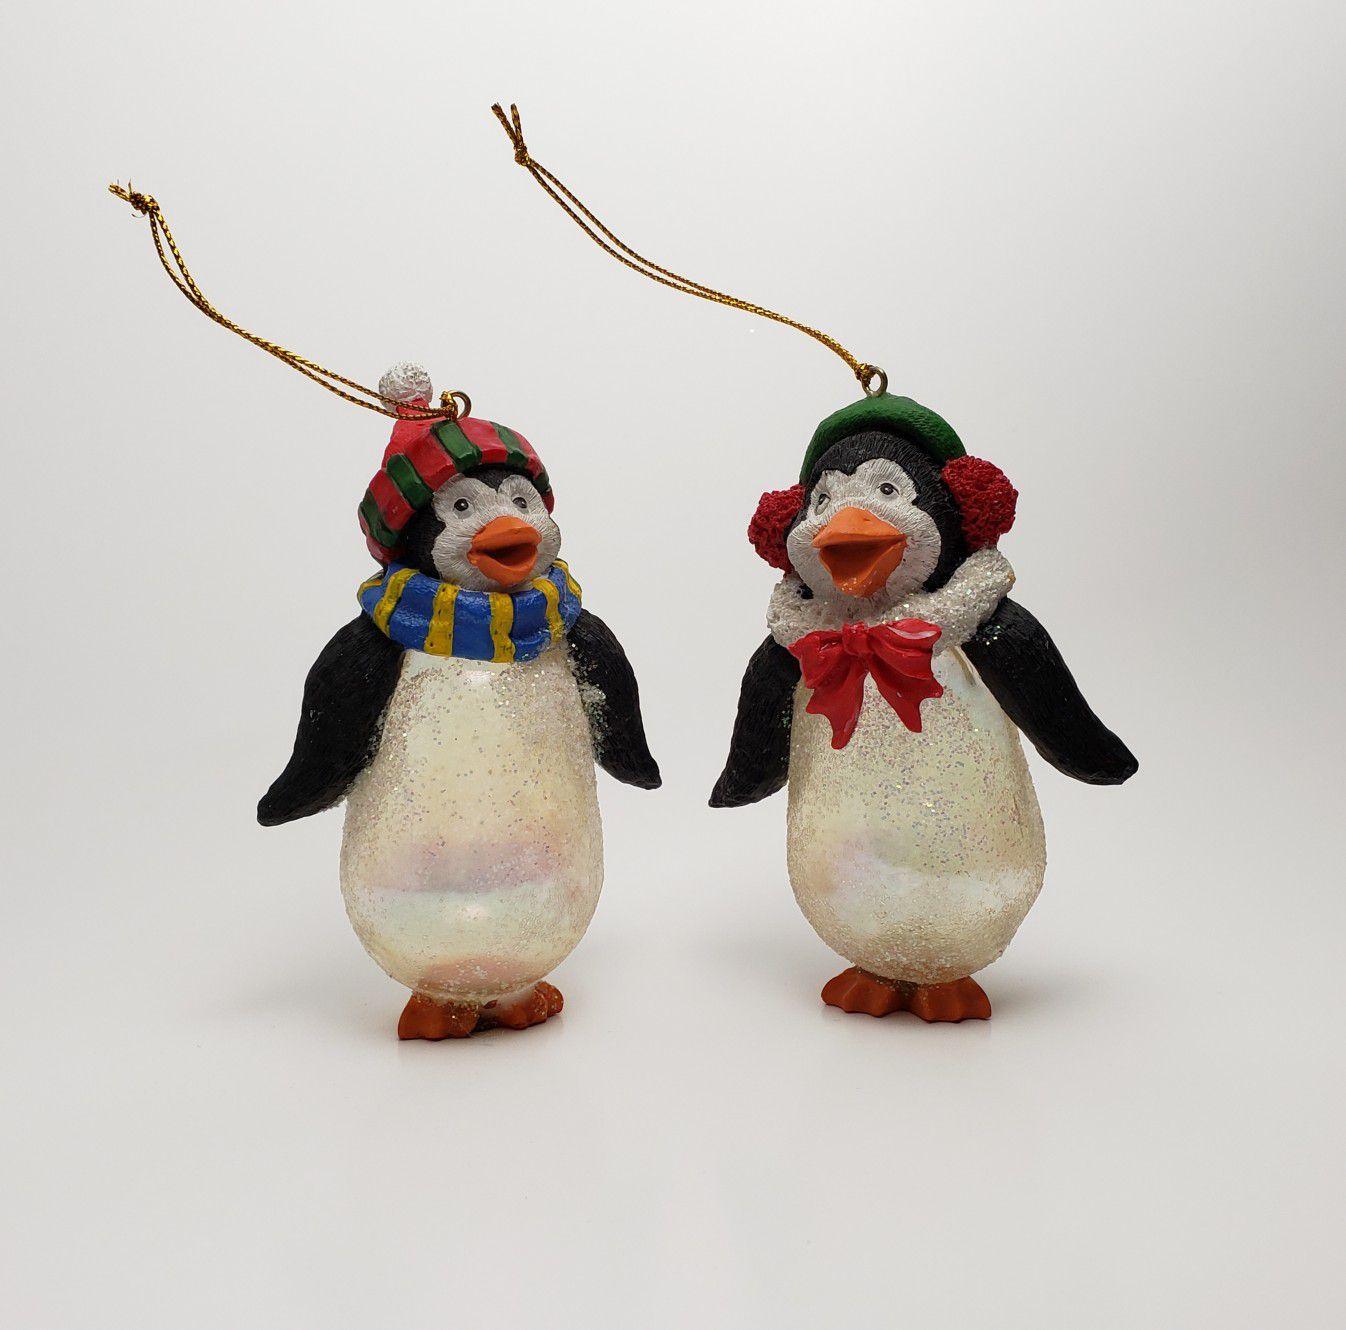 Christmas Penguin Ornaments - Set of 2